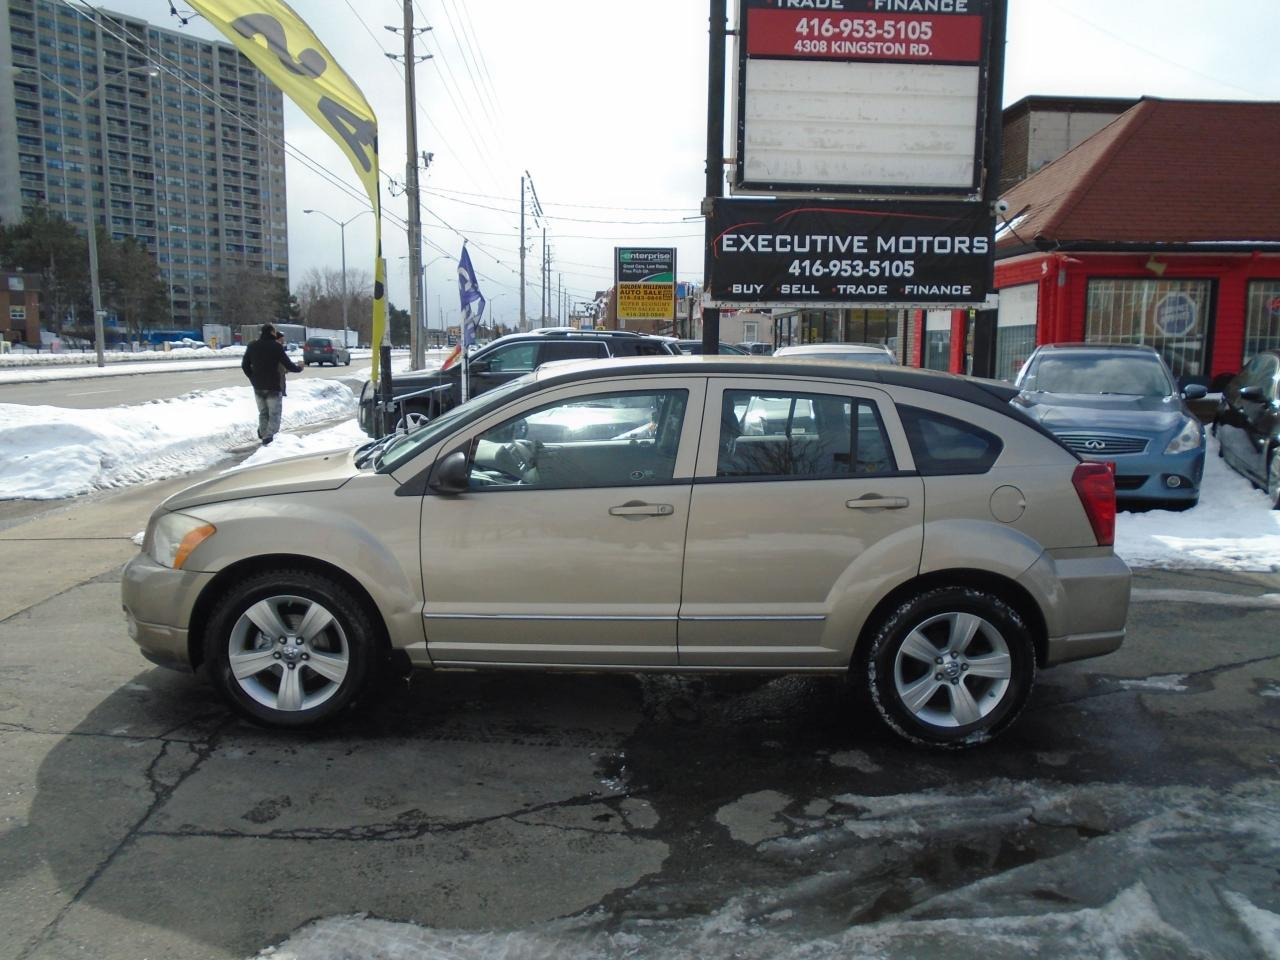 2010 Dodge Caliber SXT / ALLOYS/ HEATED SEATS/ NEW BRAKES / CERTIFIED